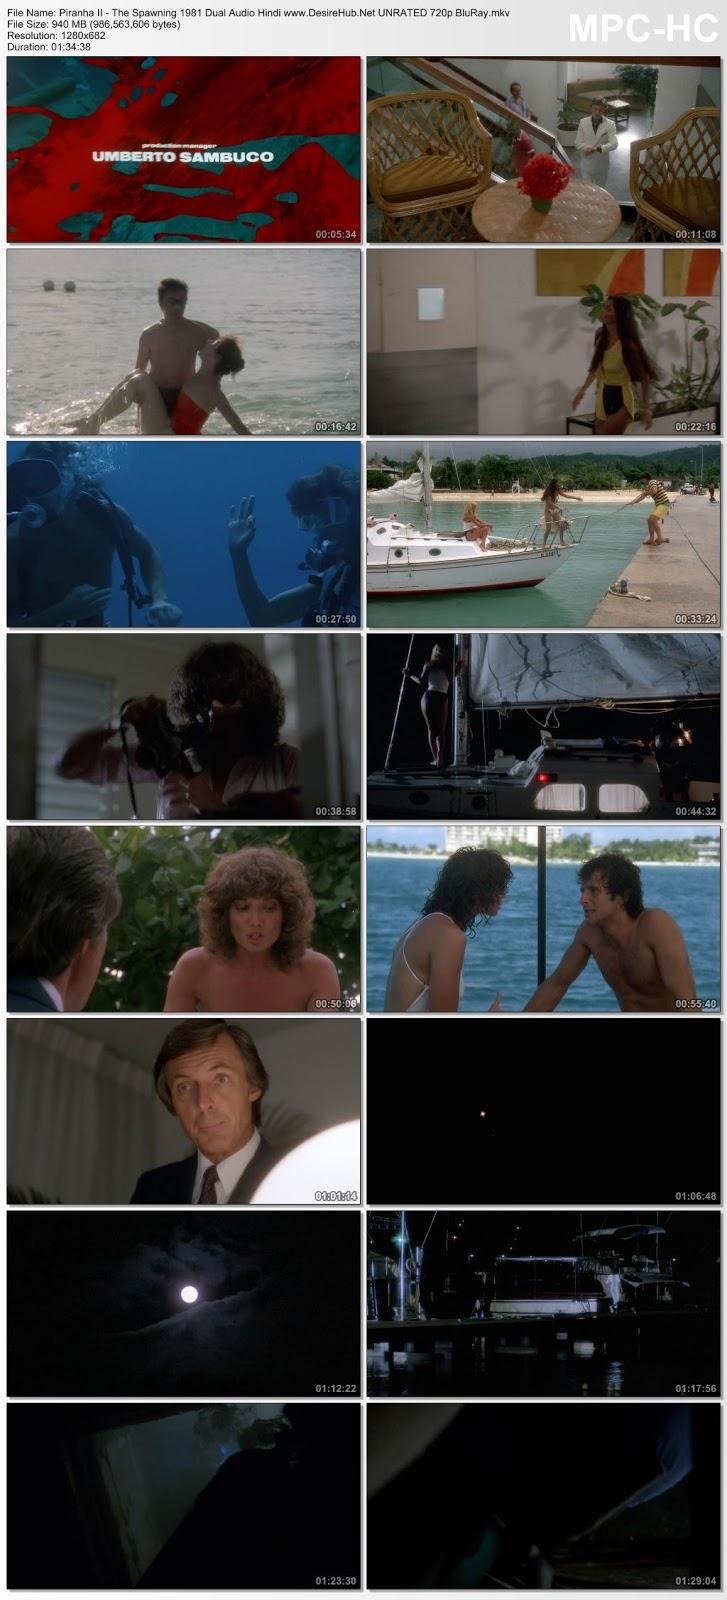 piranha ii the spawning 1981 watch online